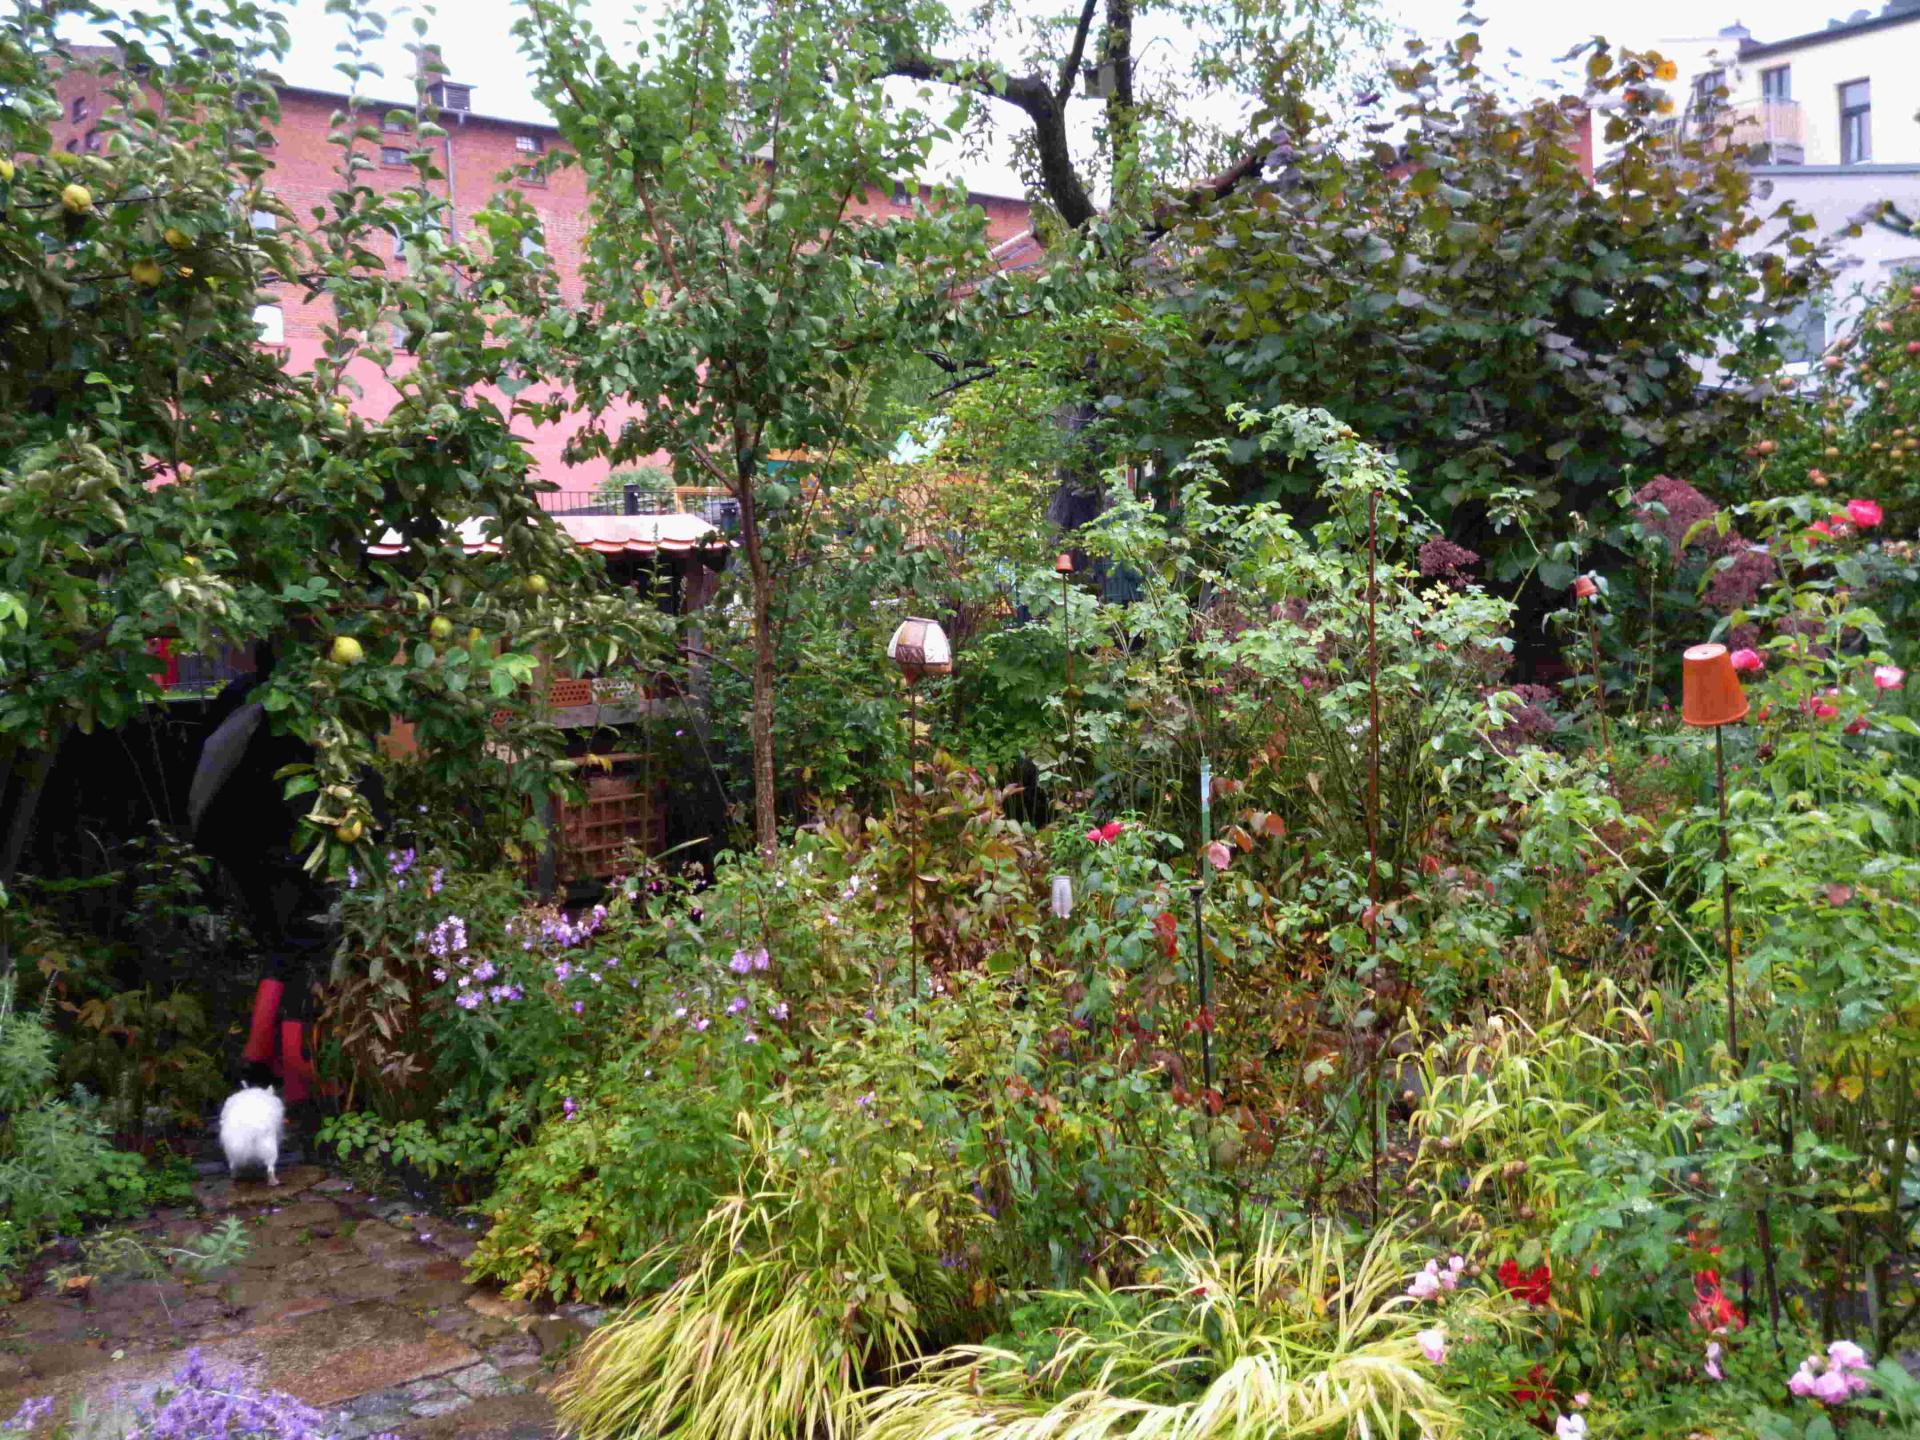 Offene Gartenpfporte 26-09-2020 Bild 15